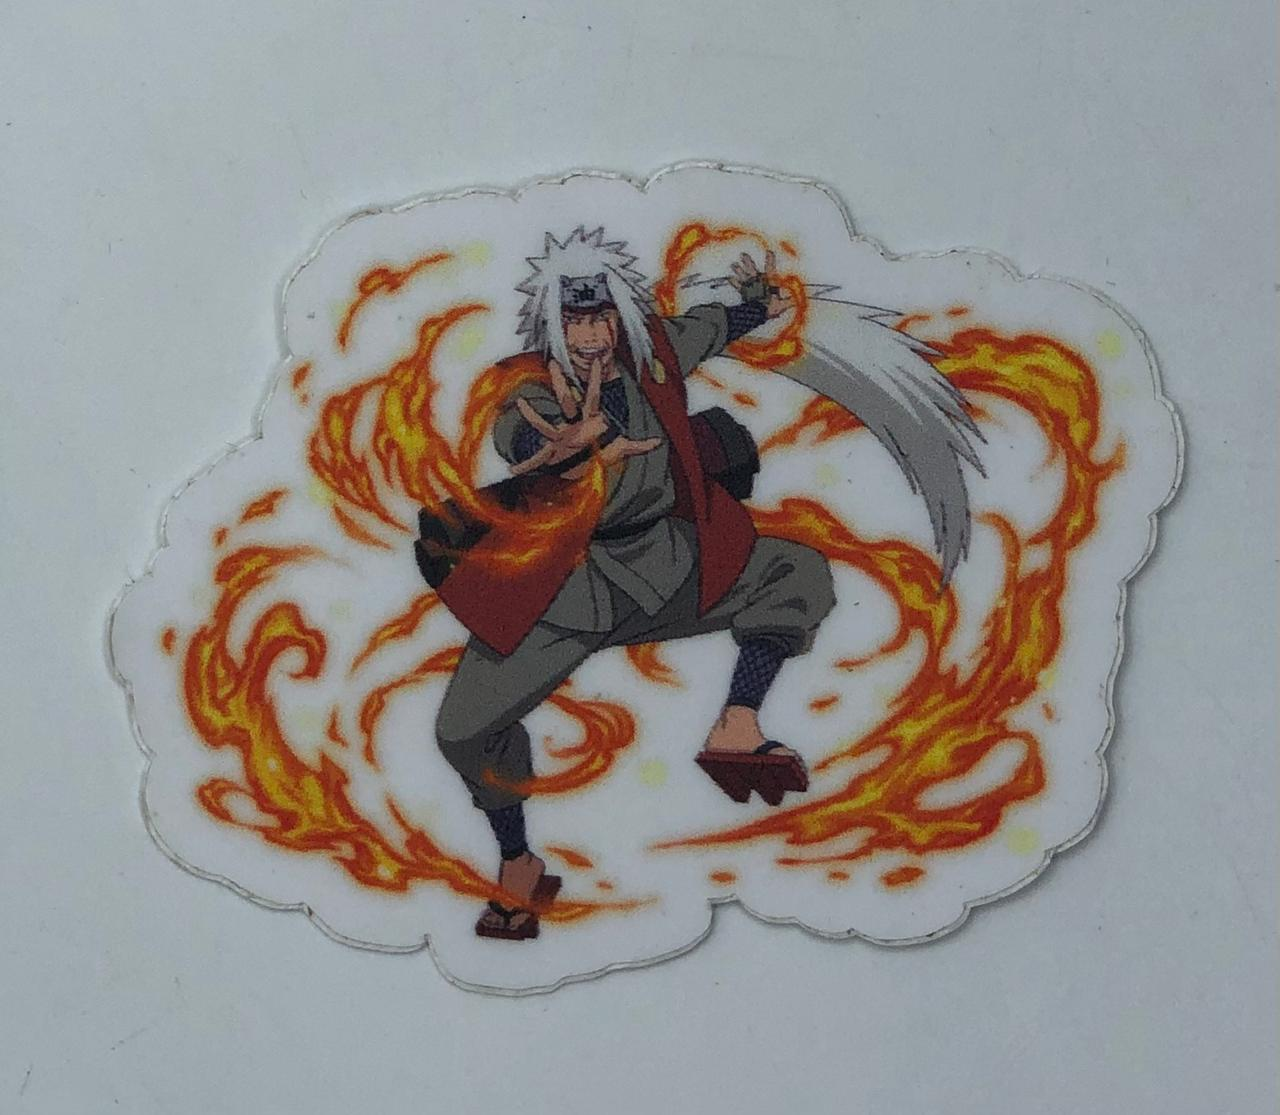 Adesivo (Sticker) Jiraya: Naruto Shippuden